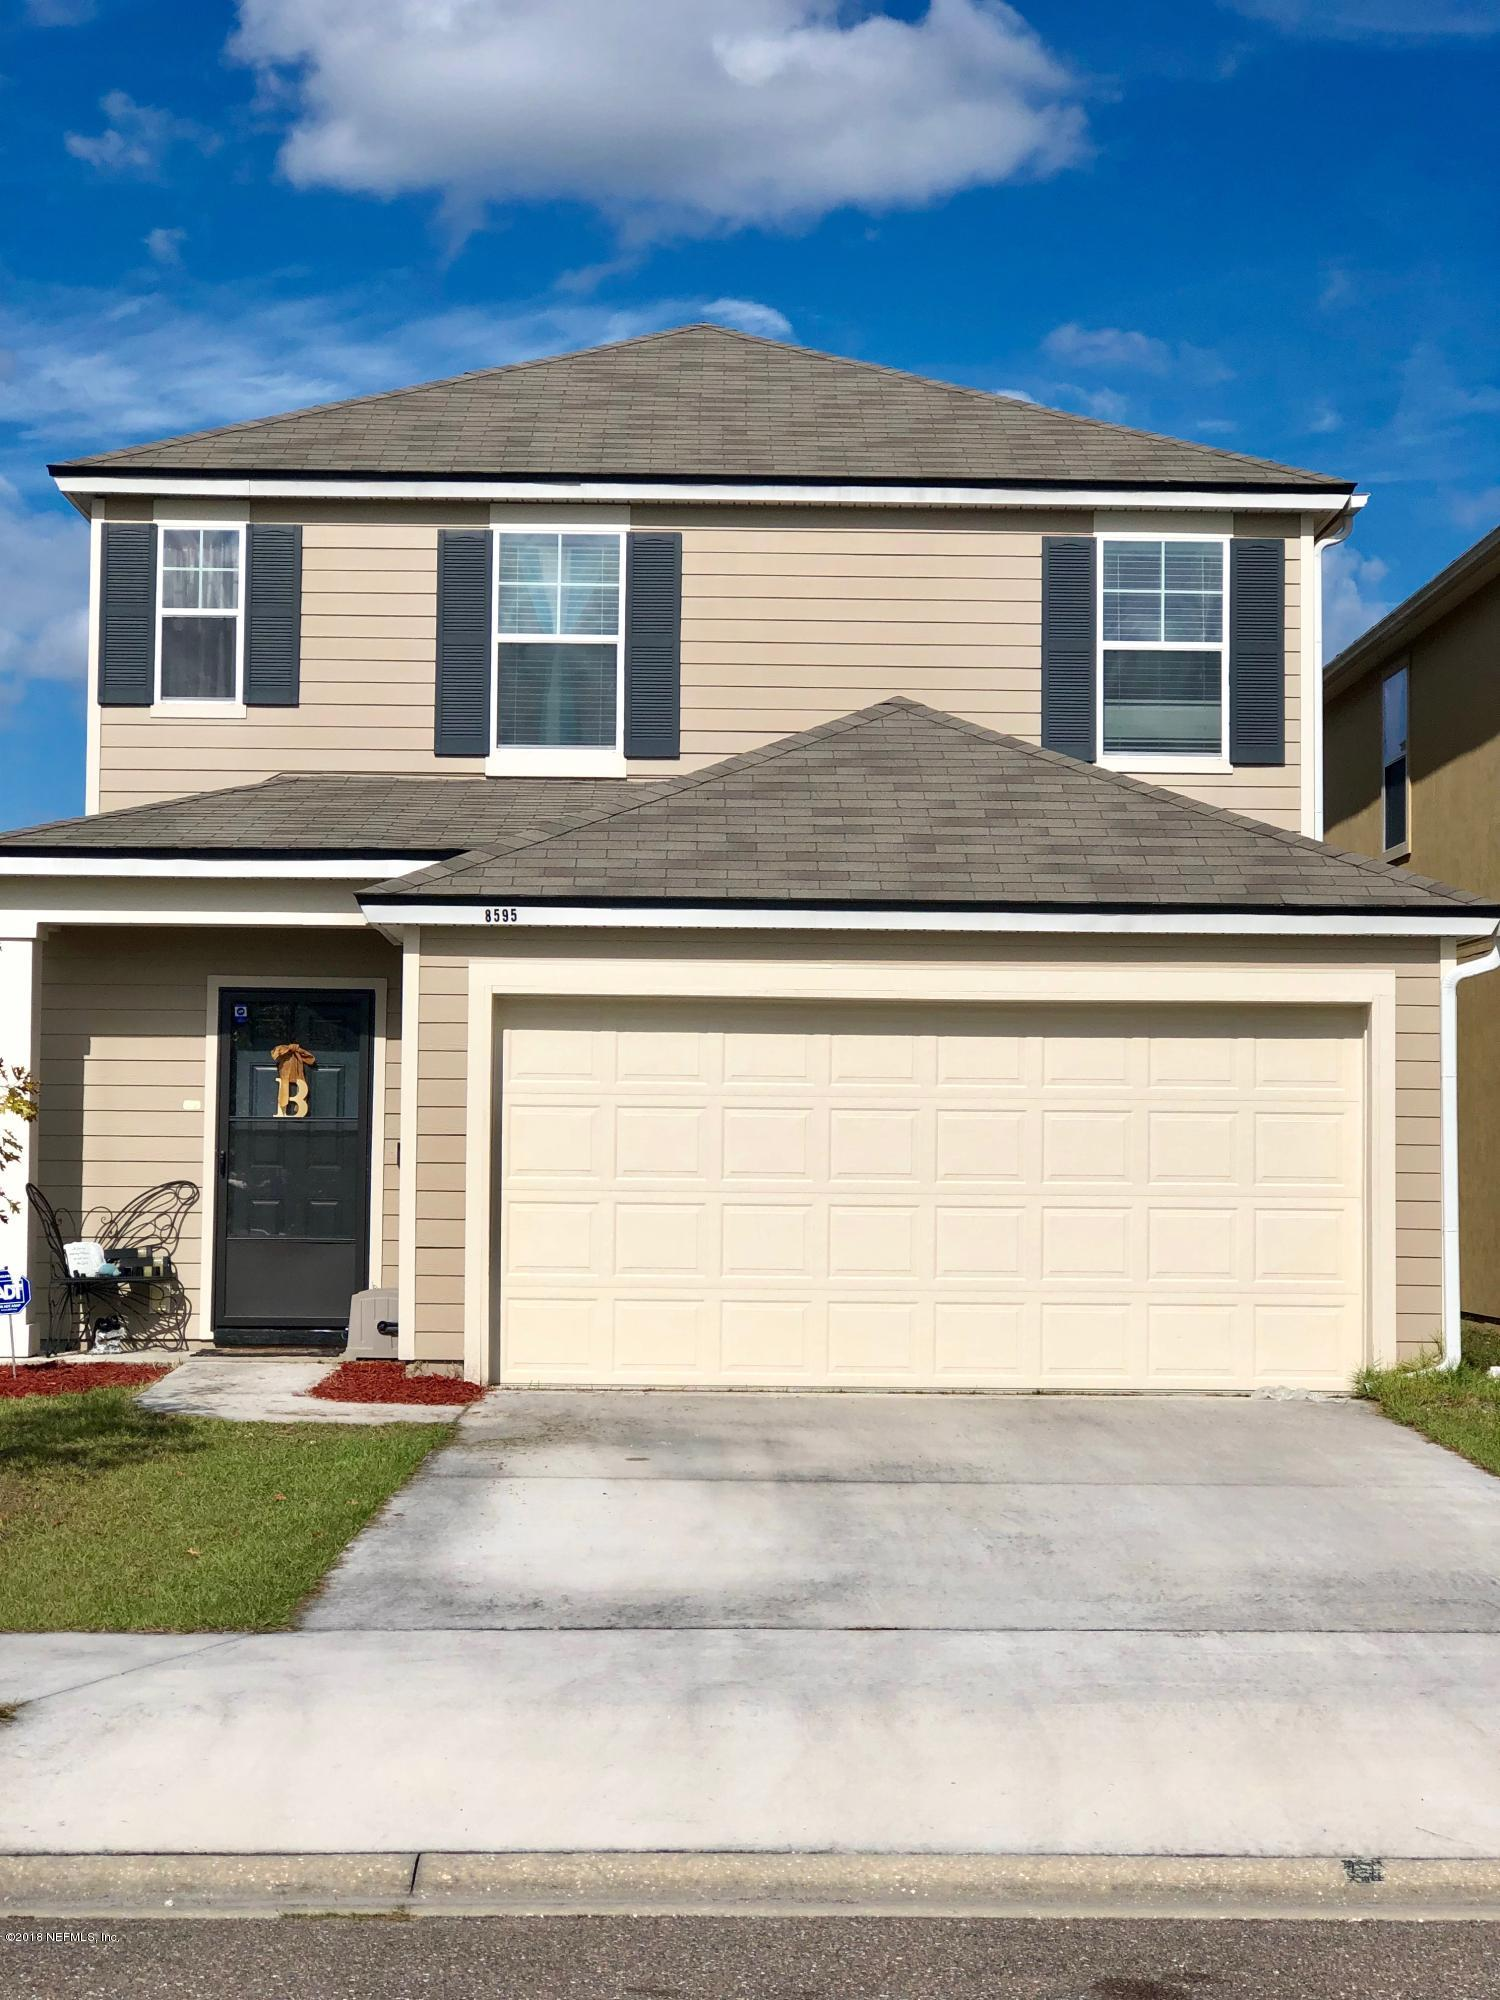 8595 Dylan Michael Dr Jacksonville, FL 32210